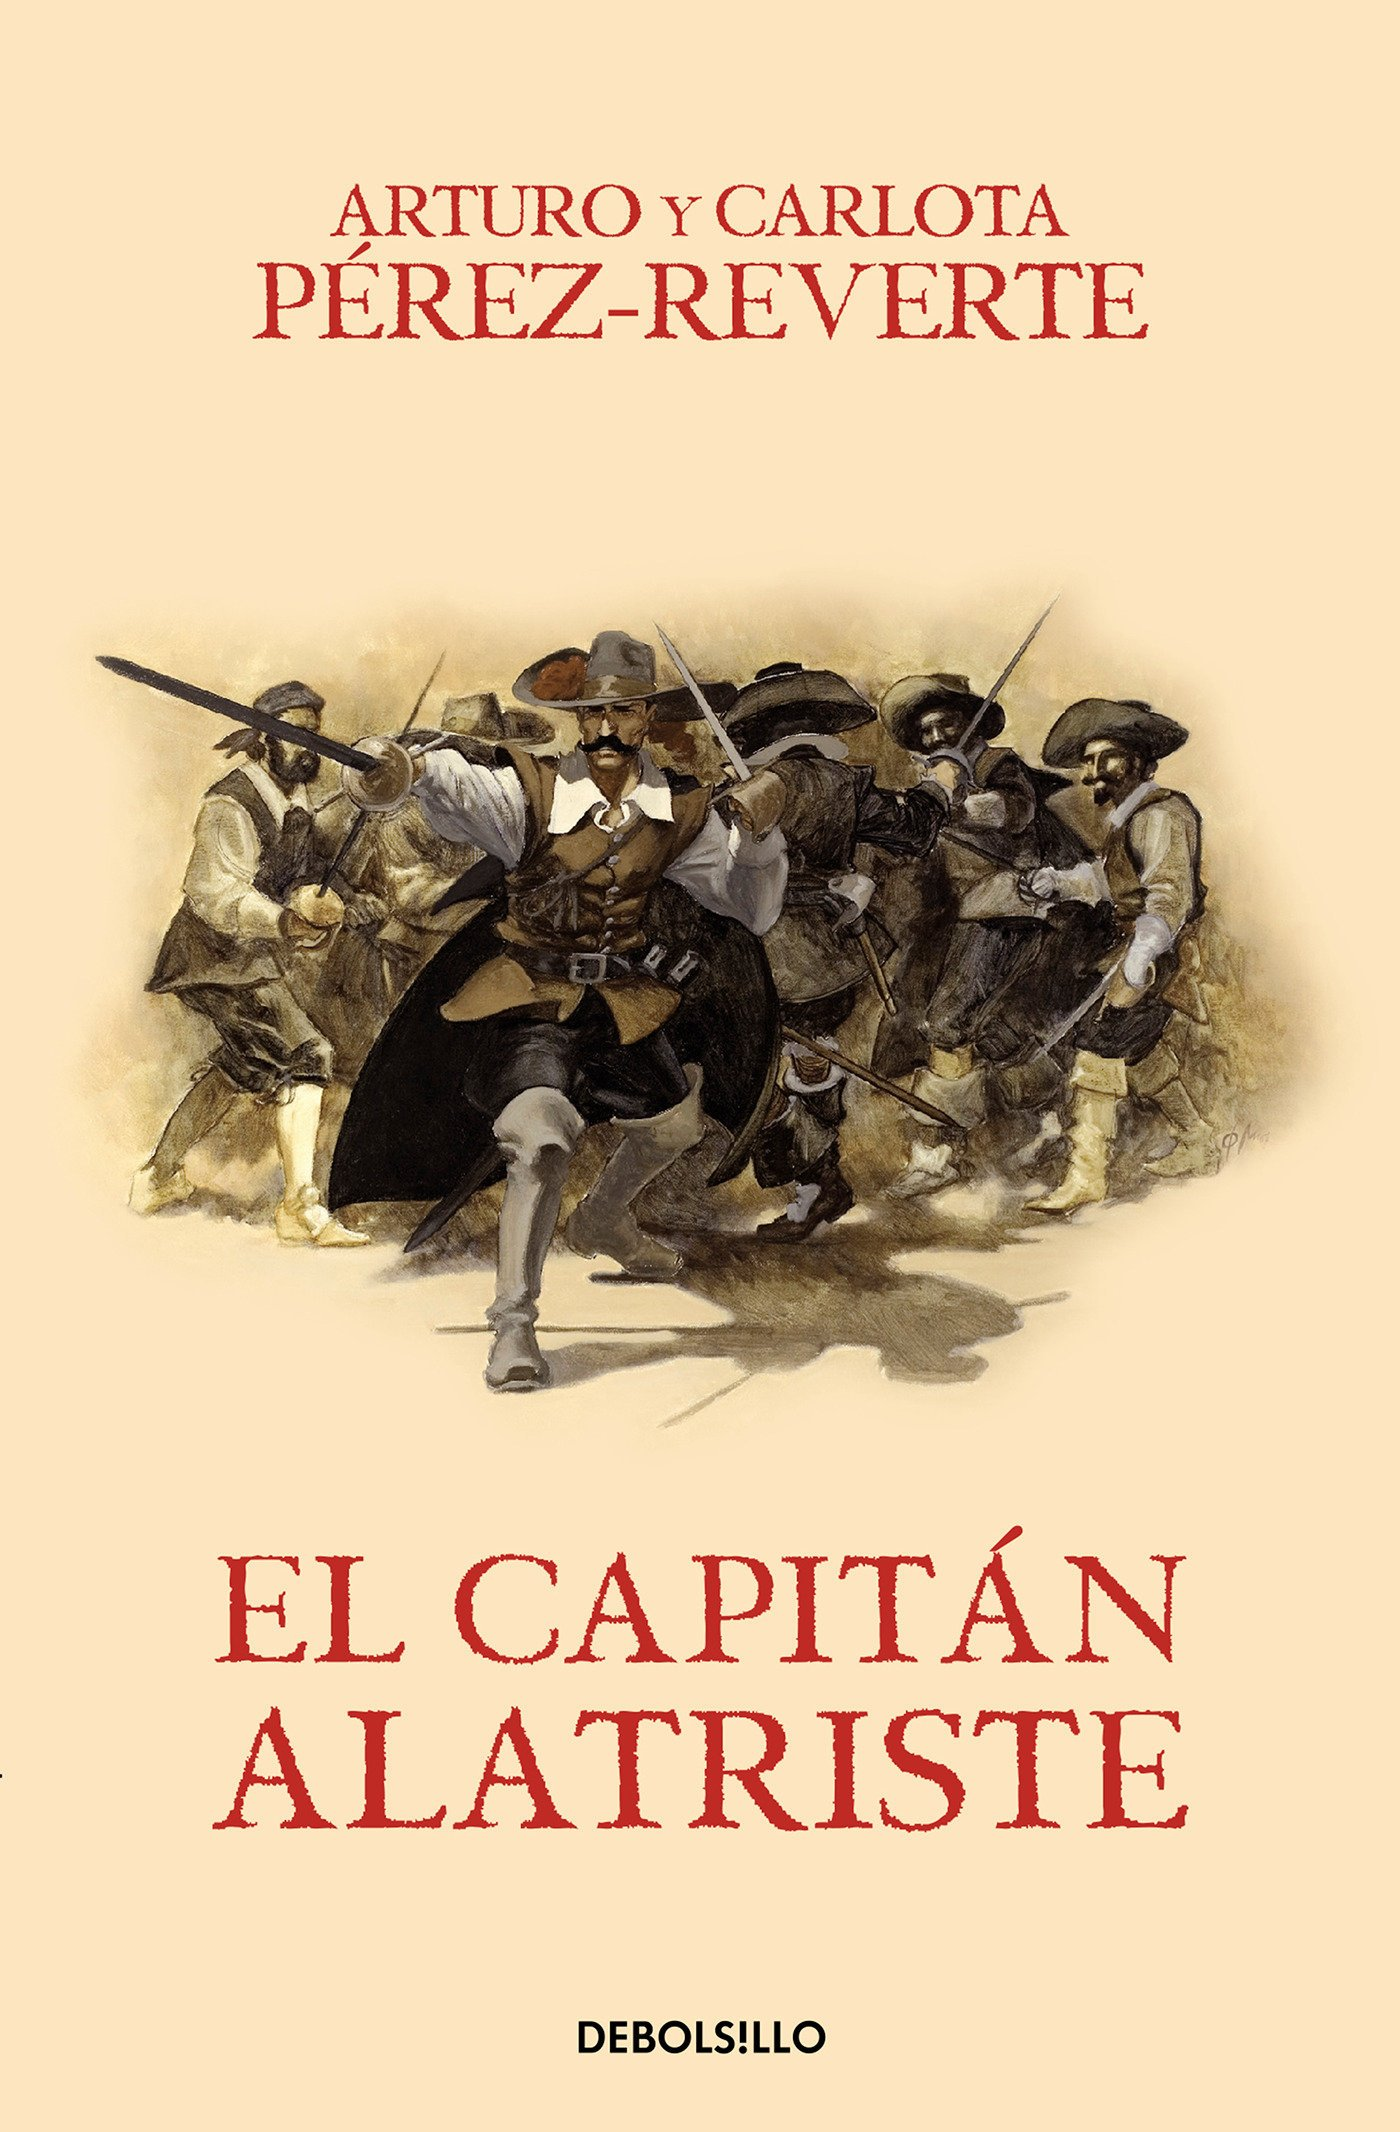 El capitán Alatriste Las aventuras del capitán Alatriste 1: Amazon.es: Pérez -Reverte, Arturo: Libros